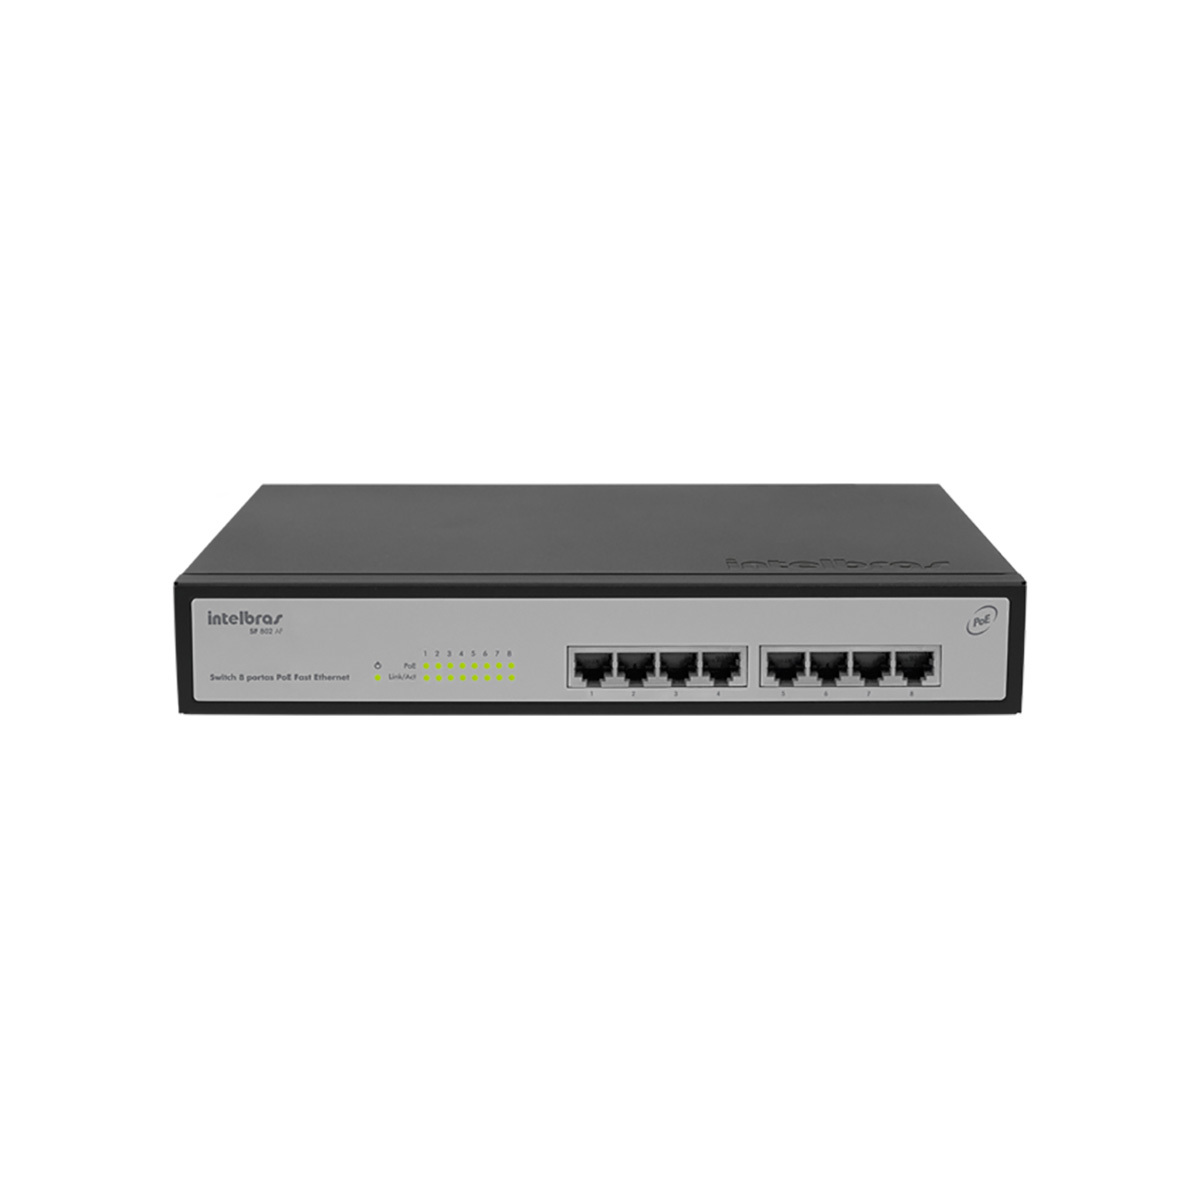 Switch 9 Portas Fast com 8 Portas POE+ Intelbras SF 900 POE